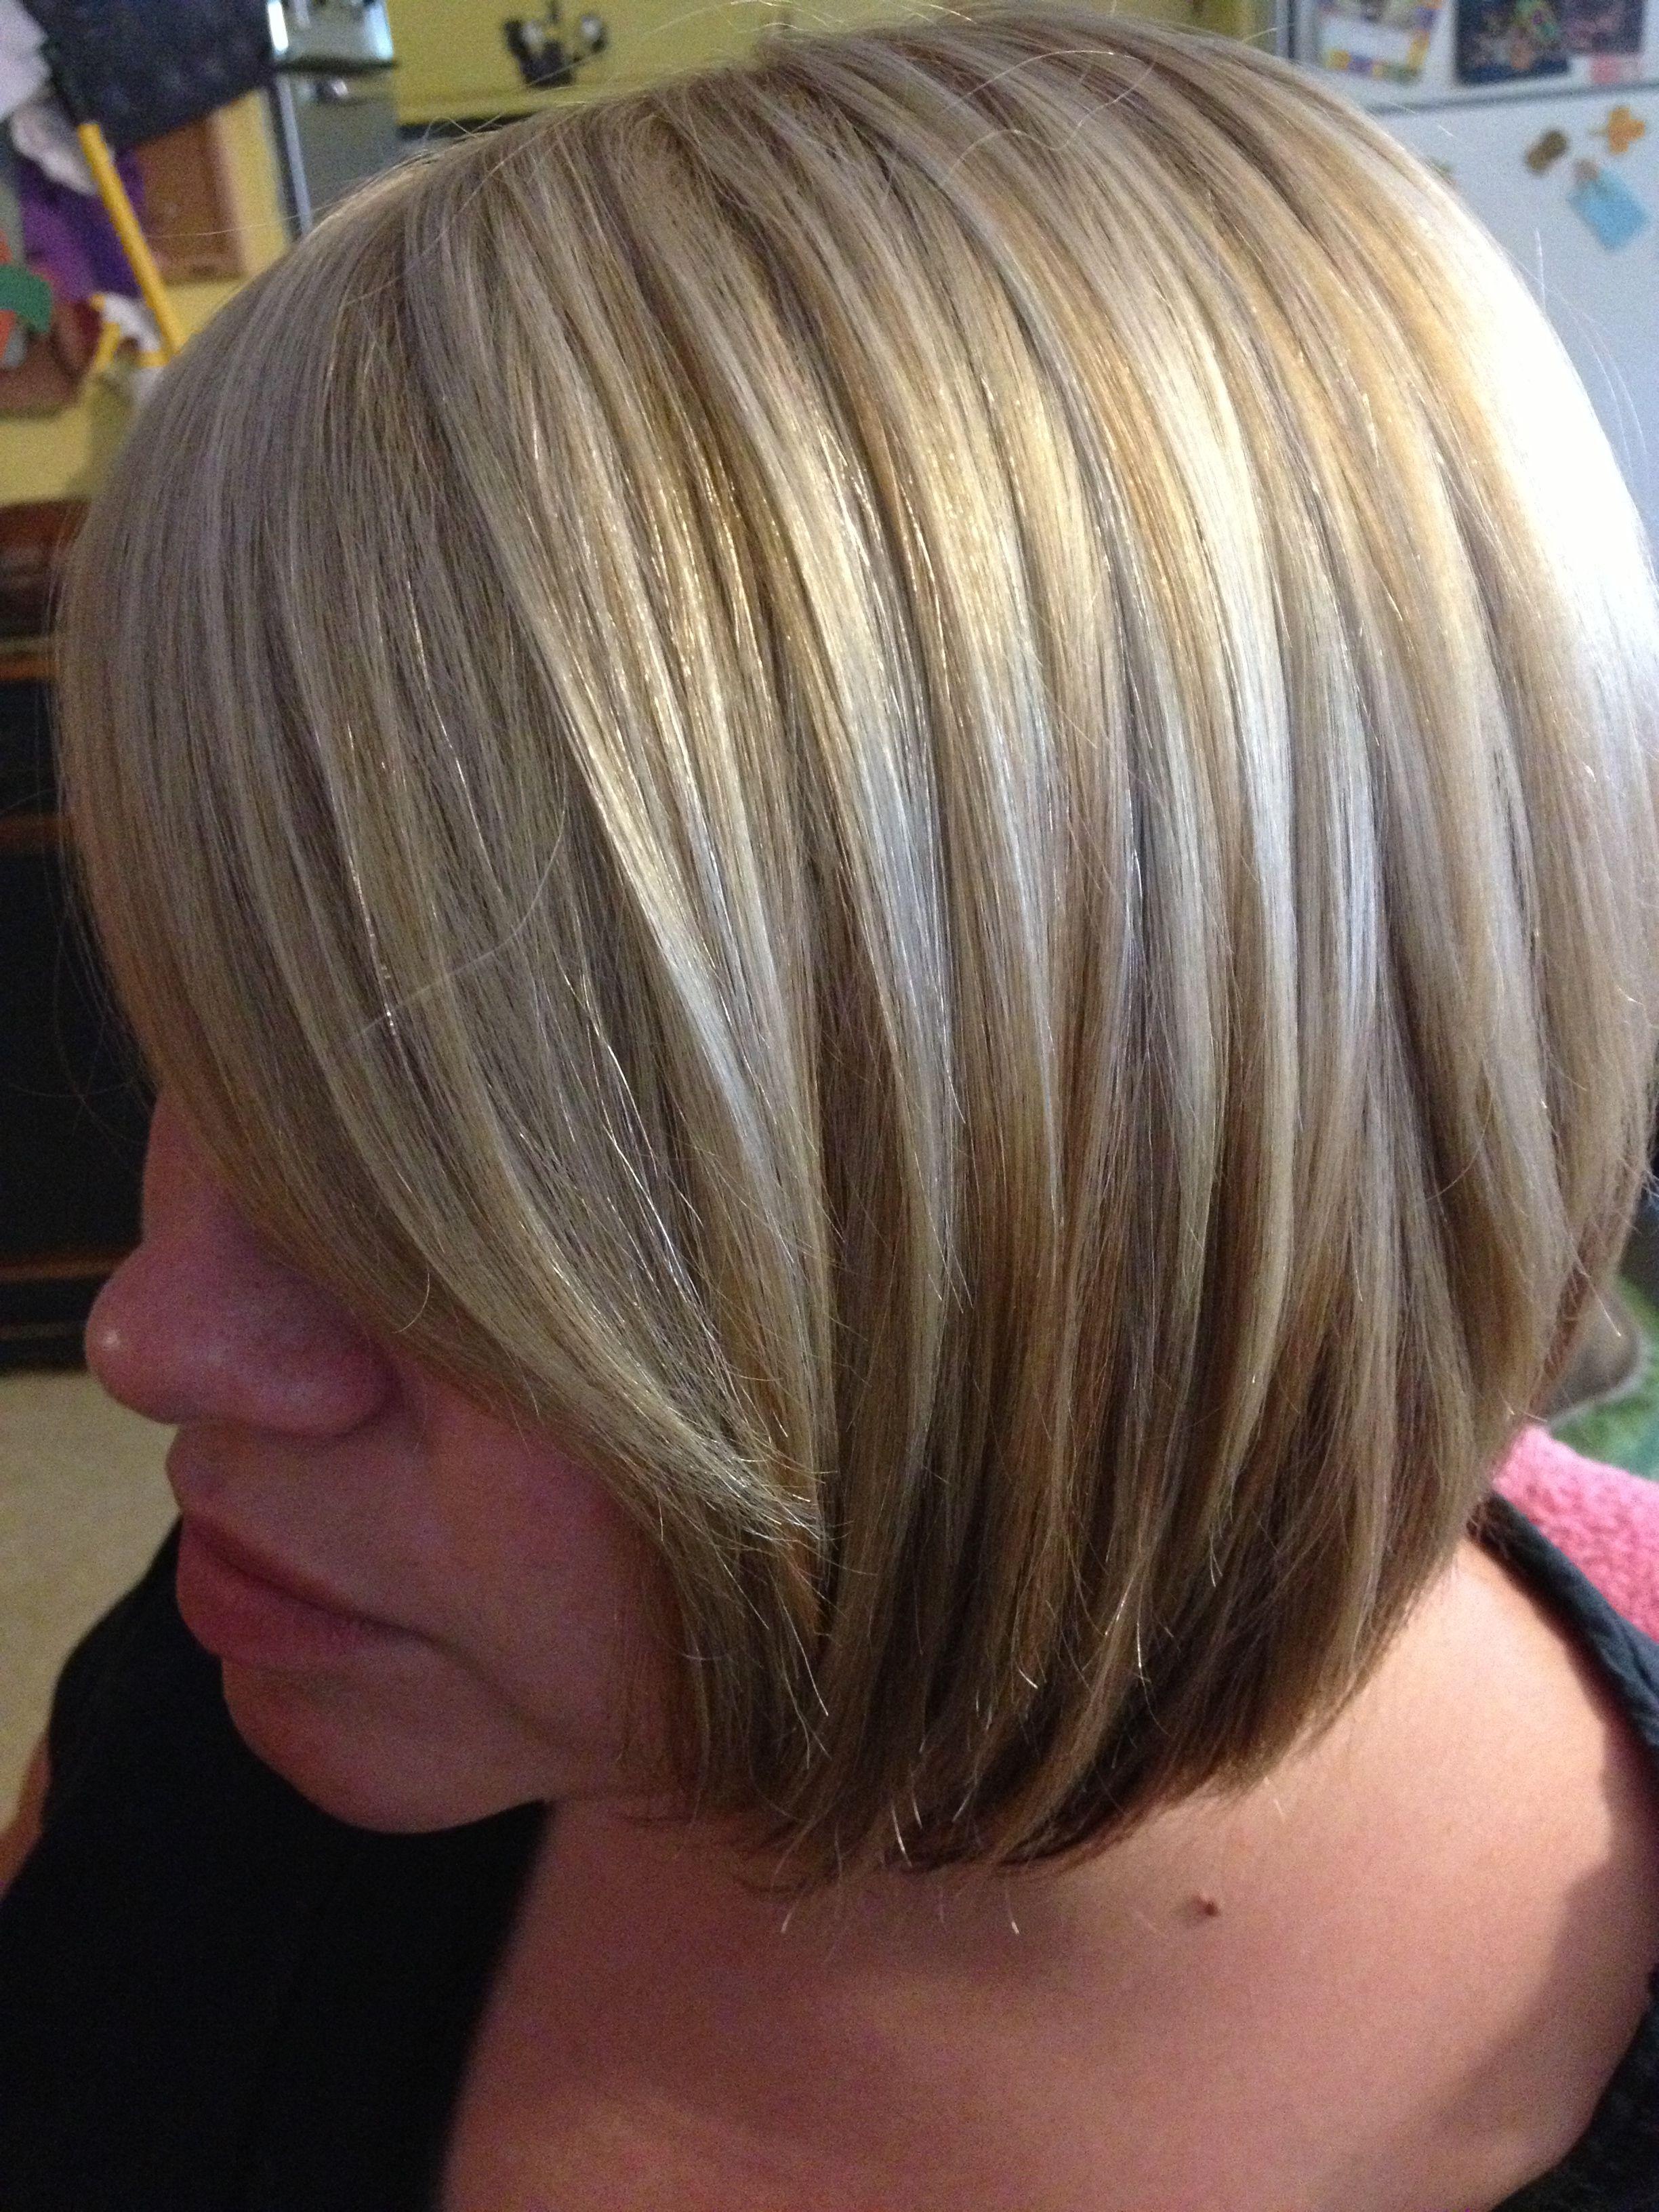 Blonde on blonde foiled hair | Hair creations | Pinterest